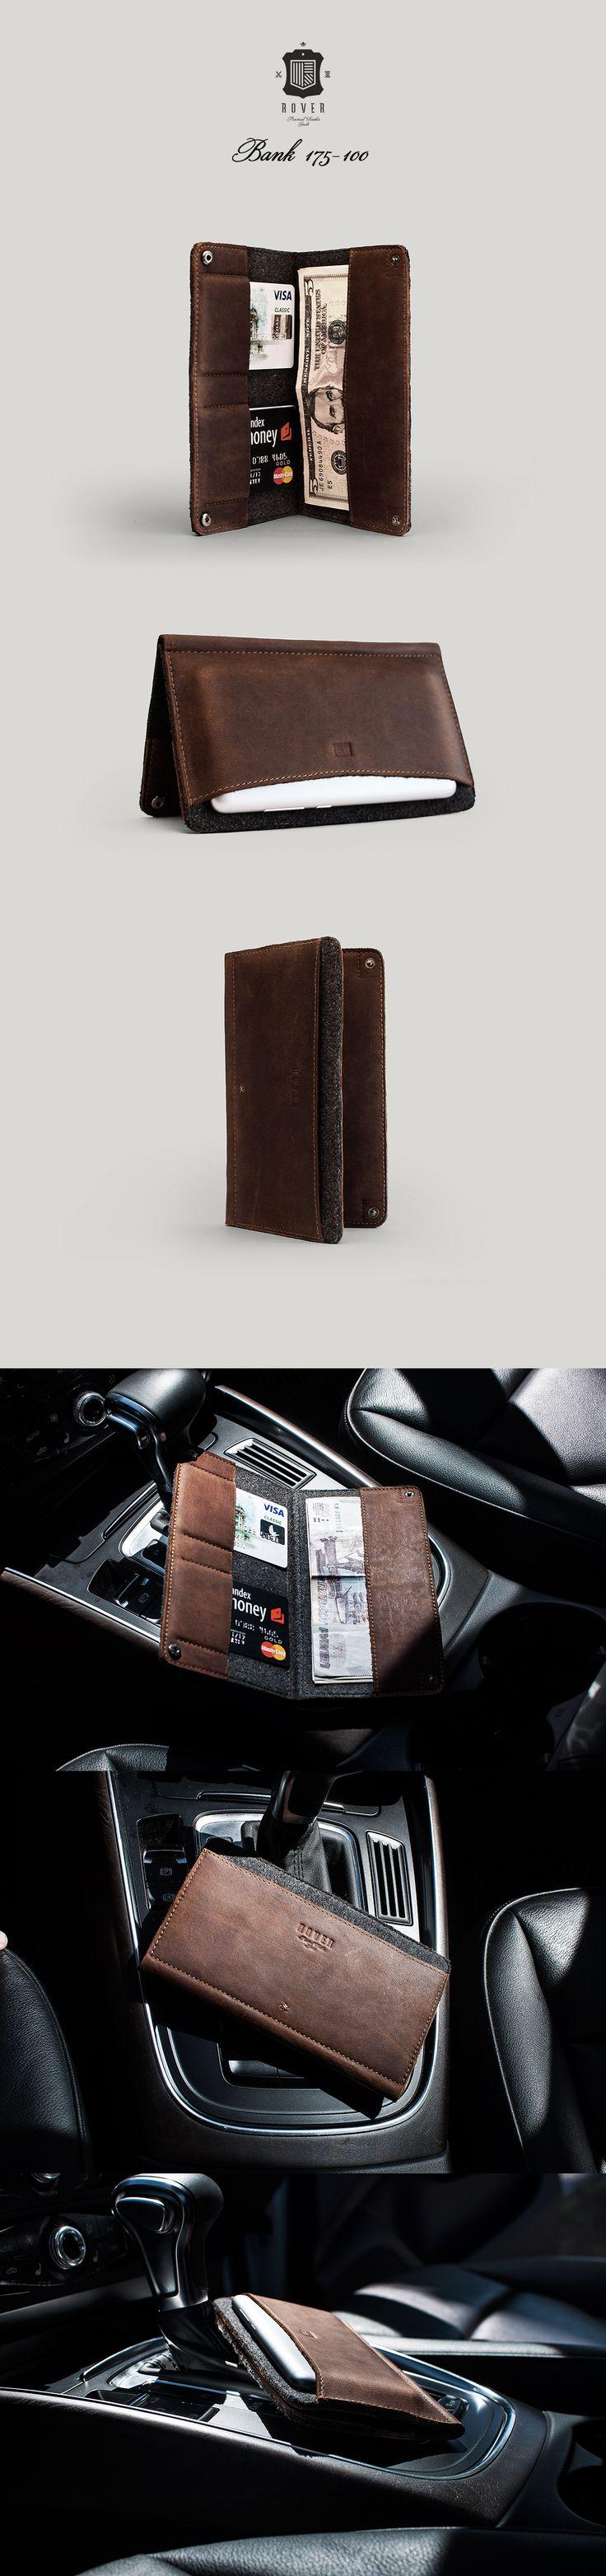 ROVER Bank 175-100 iPhone Case wallet